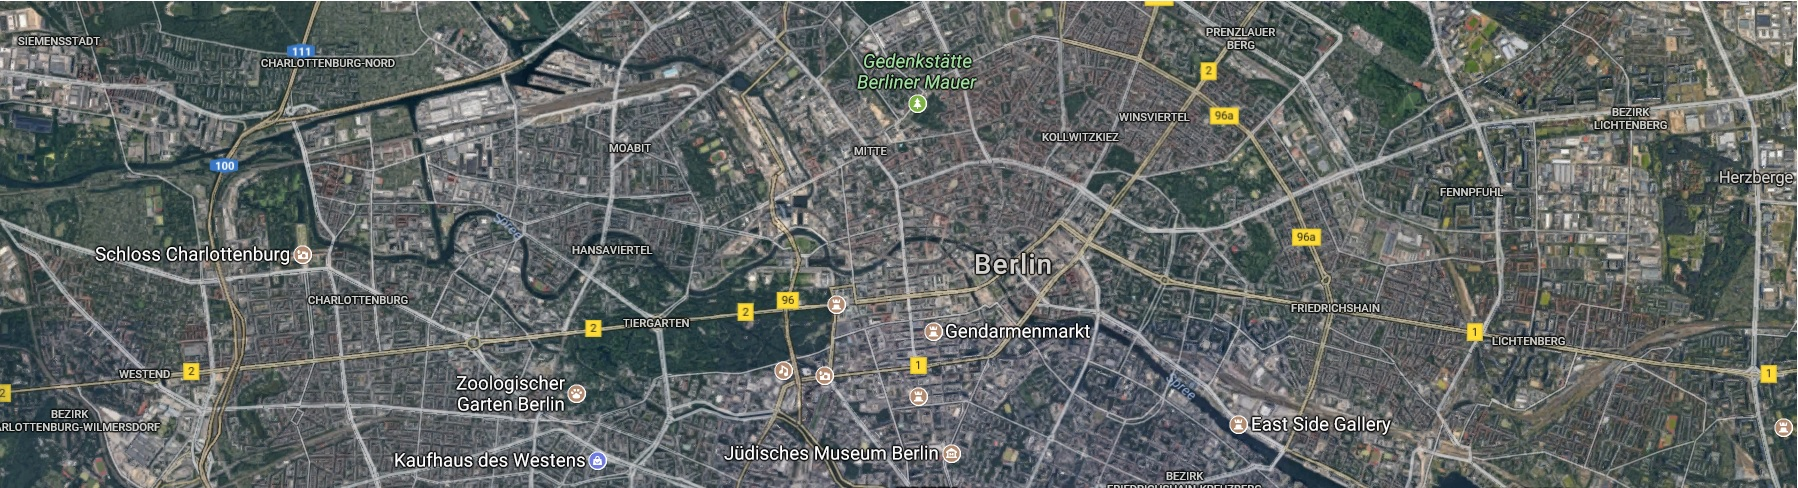 Stadtplan Mitte